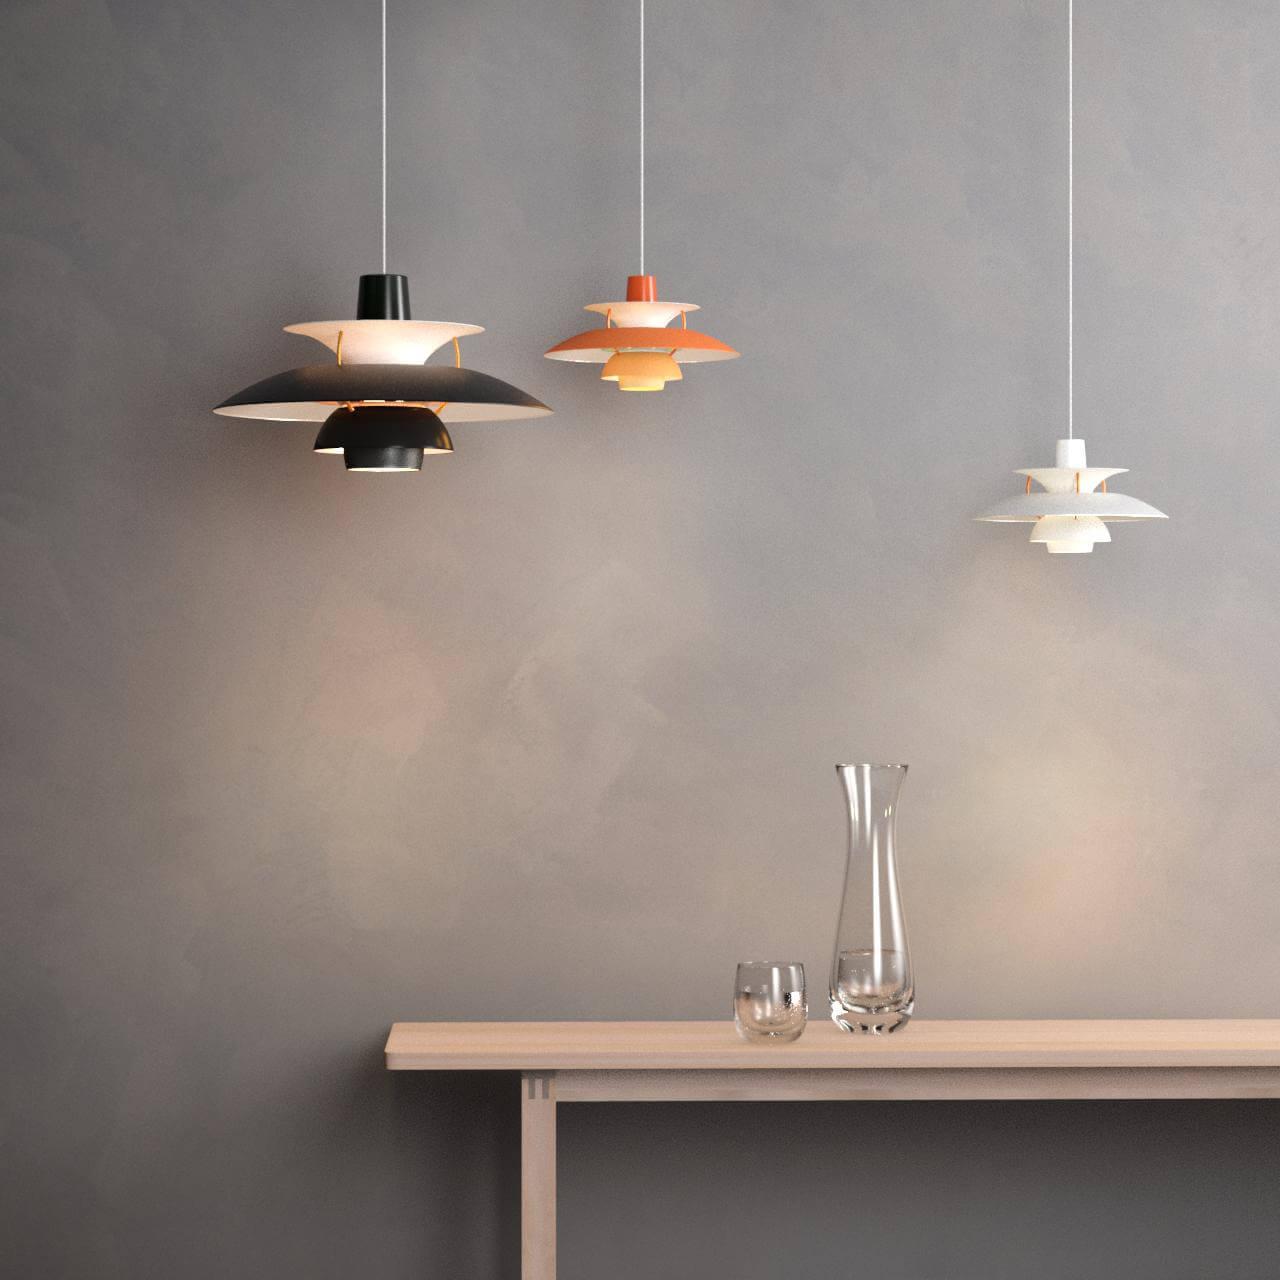 3D-Design von Alina Häckl